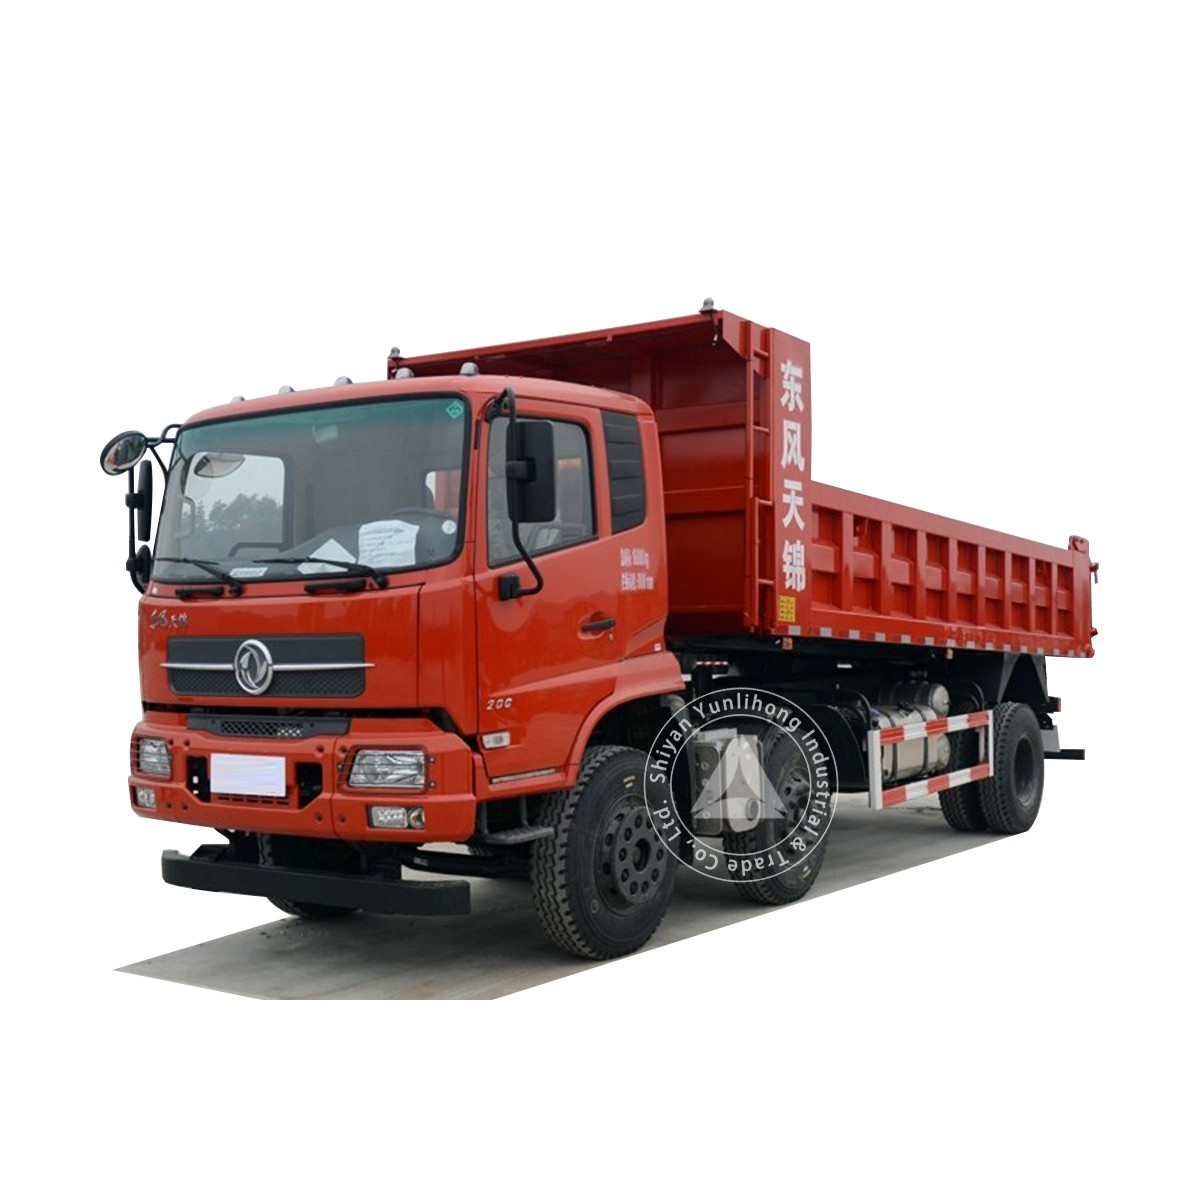 Dongfeng KR 6x2 180hp GVW17.2 Ton 15m3 To 18m3 Dump Truck